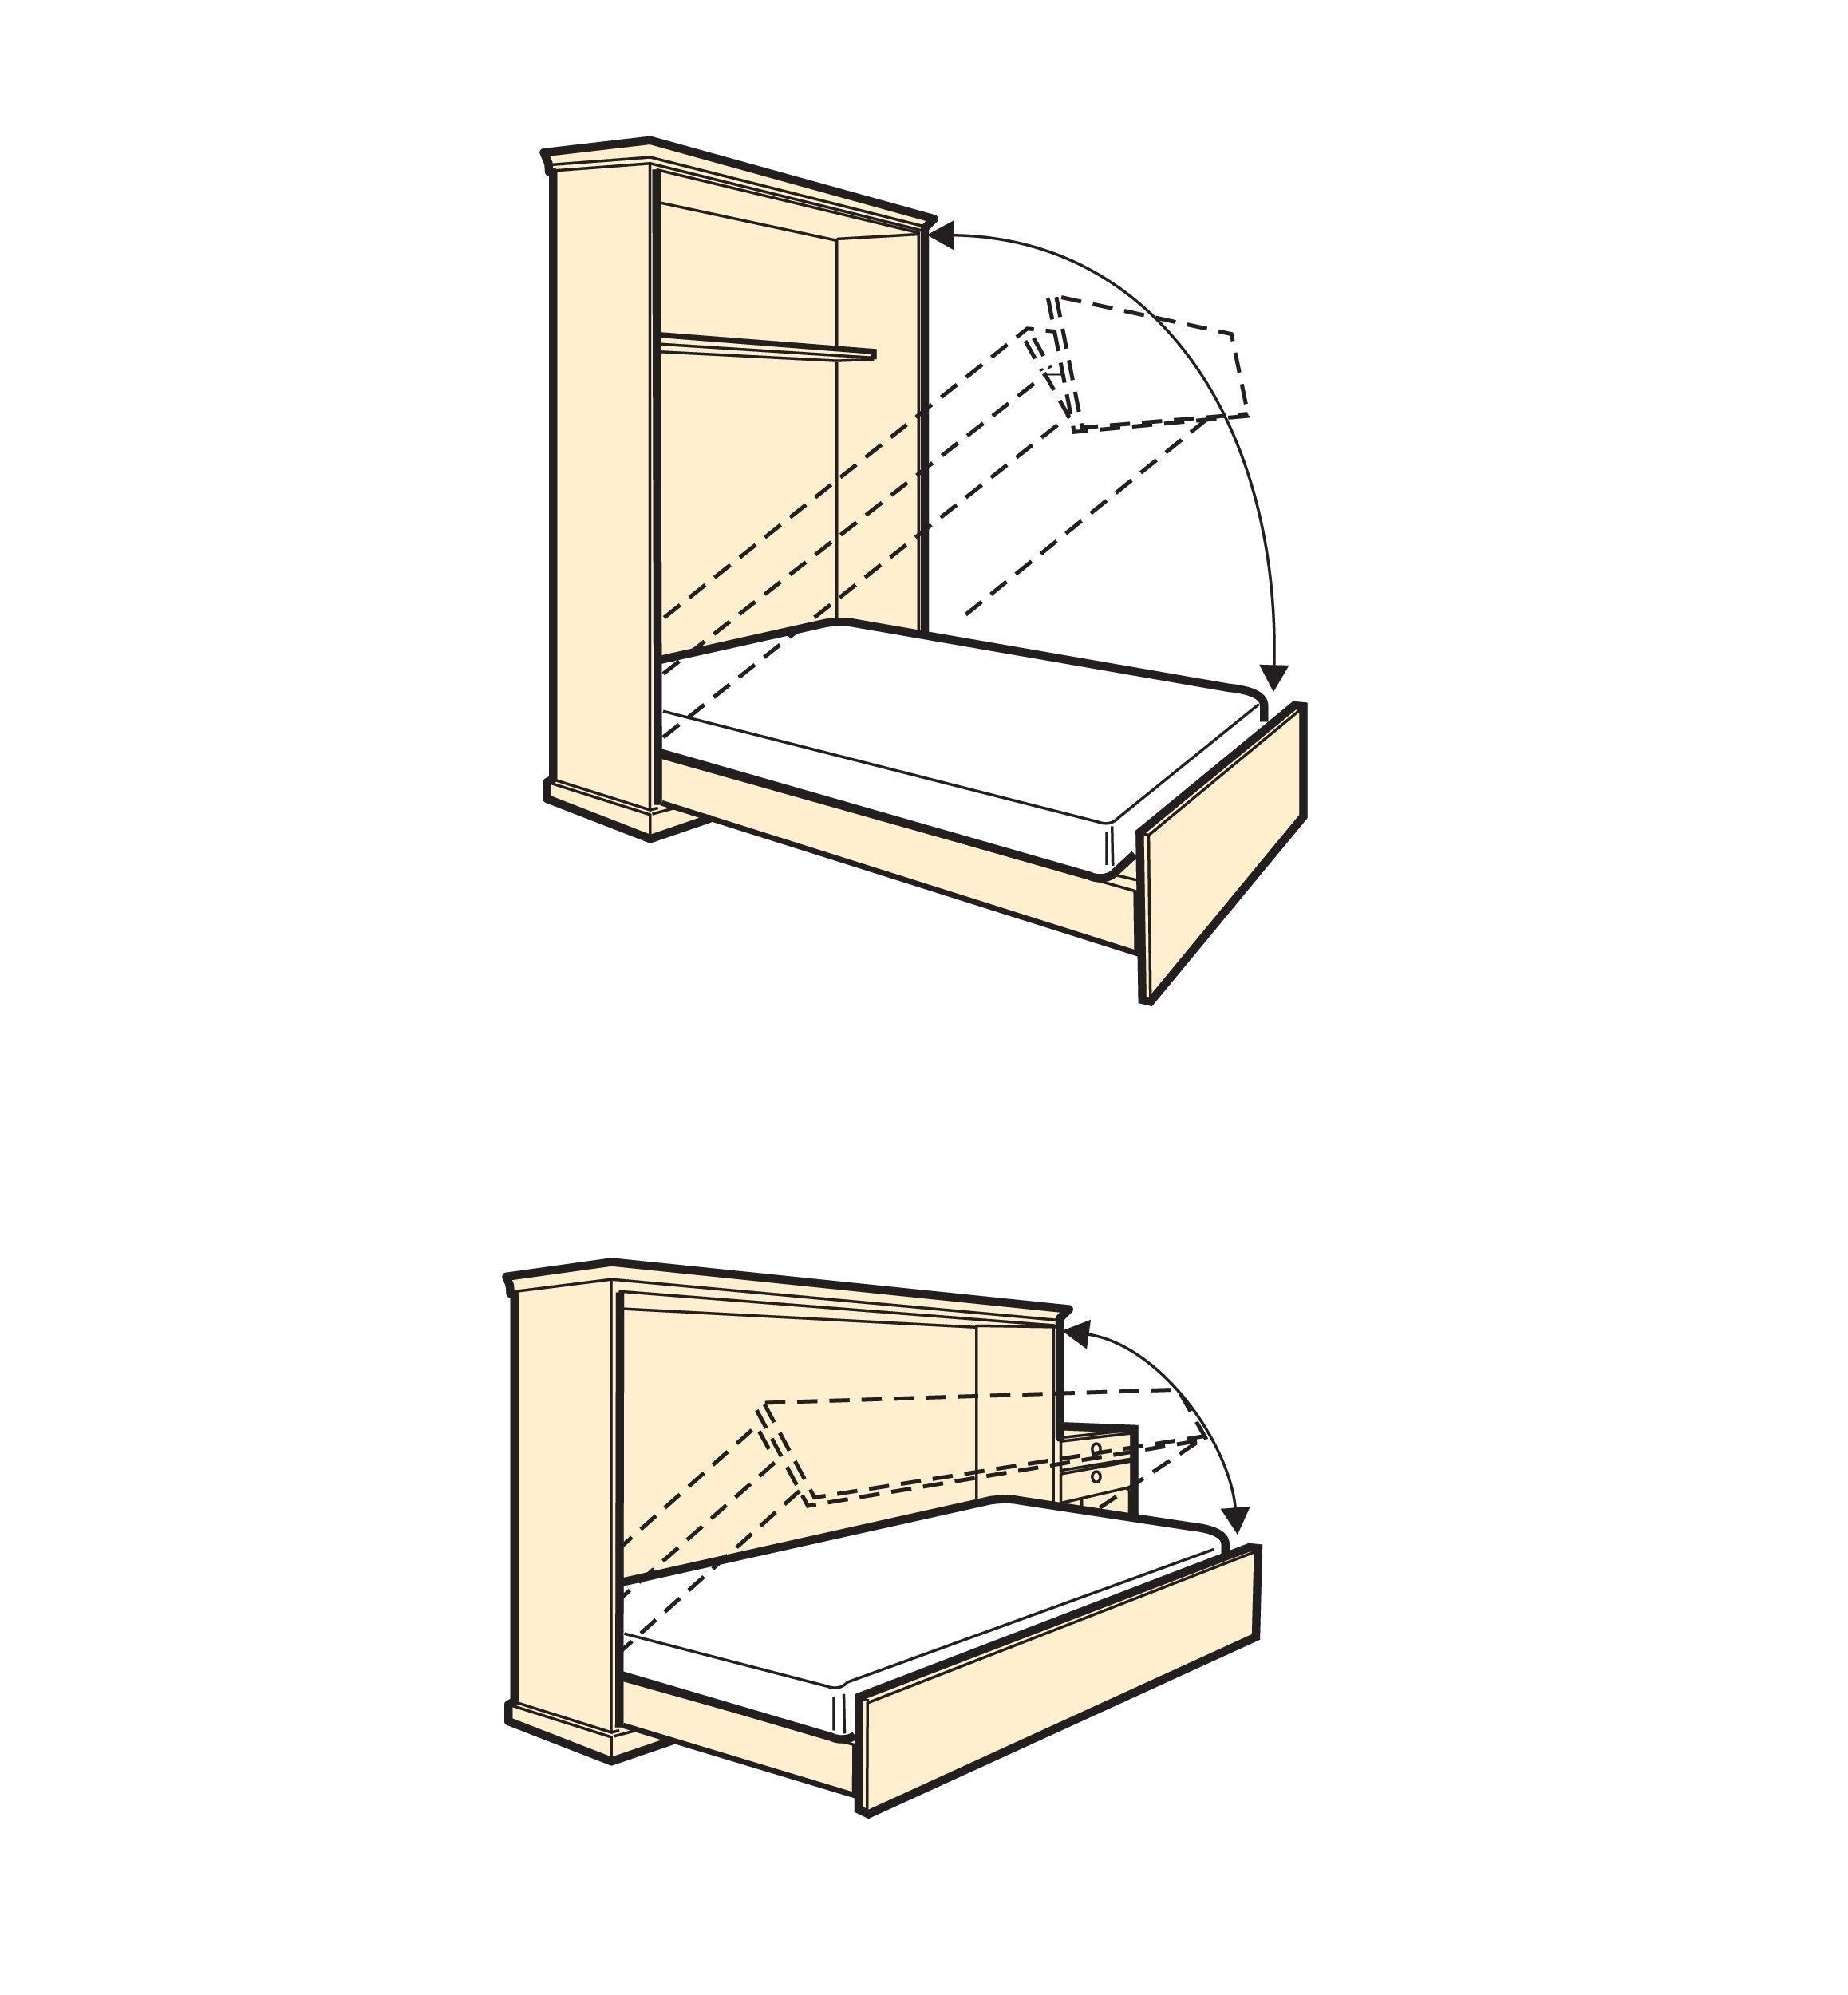 FoldDown Bed Hardware Kits Меблі